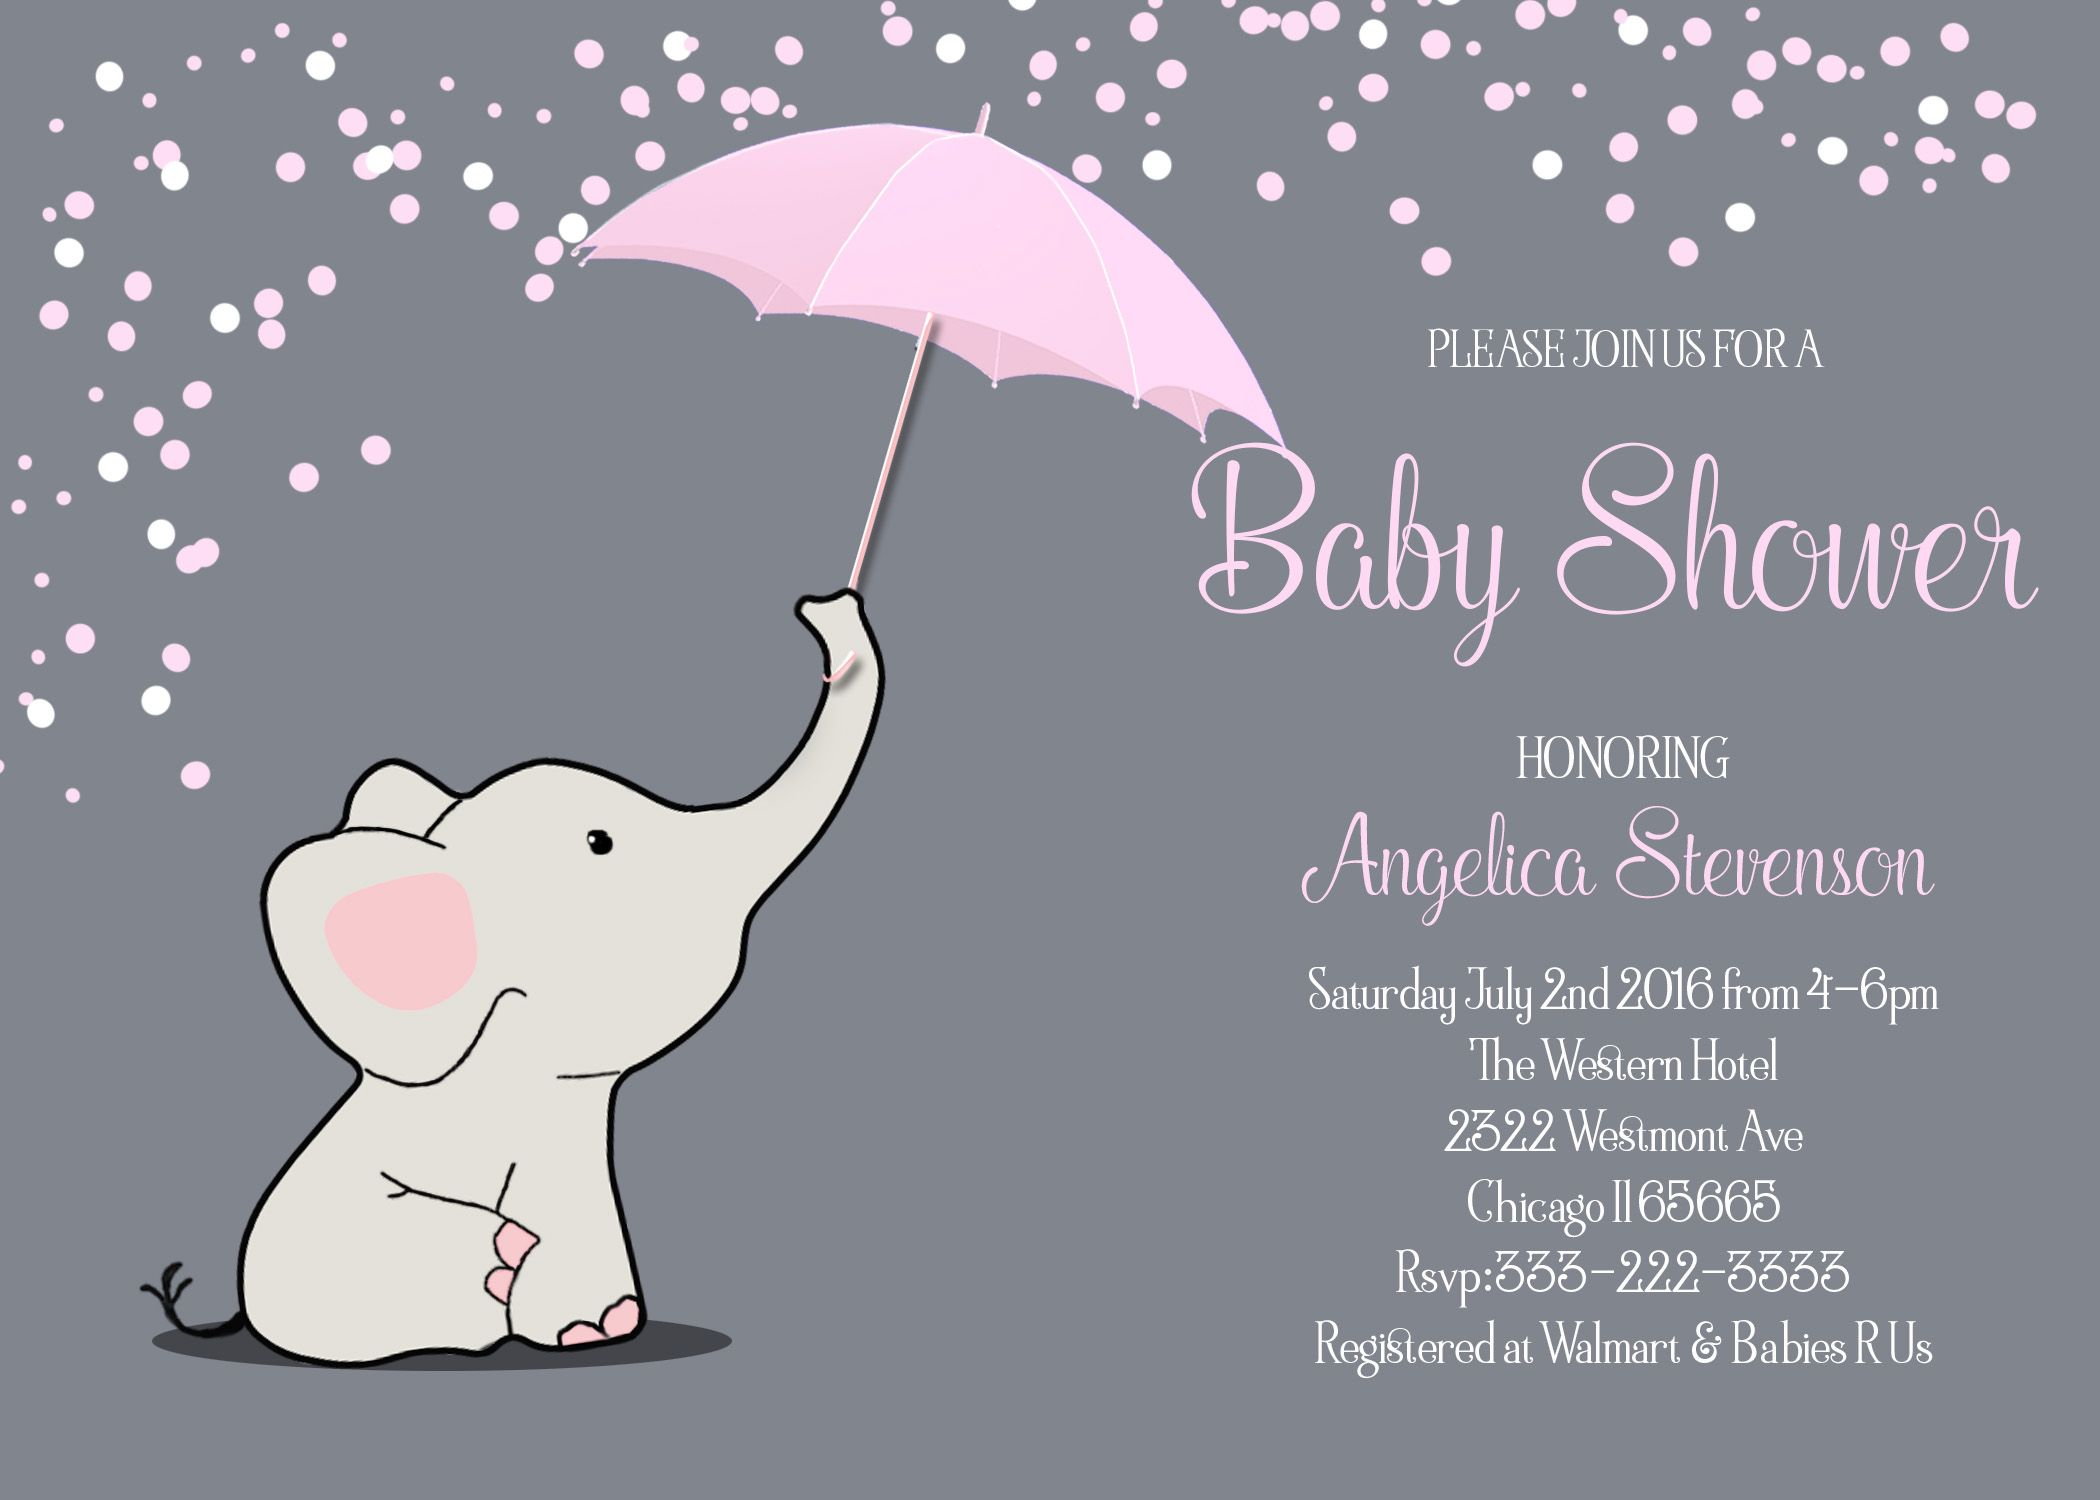 Pink Elephant w Umbrella Baby Shower Printable